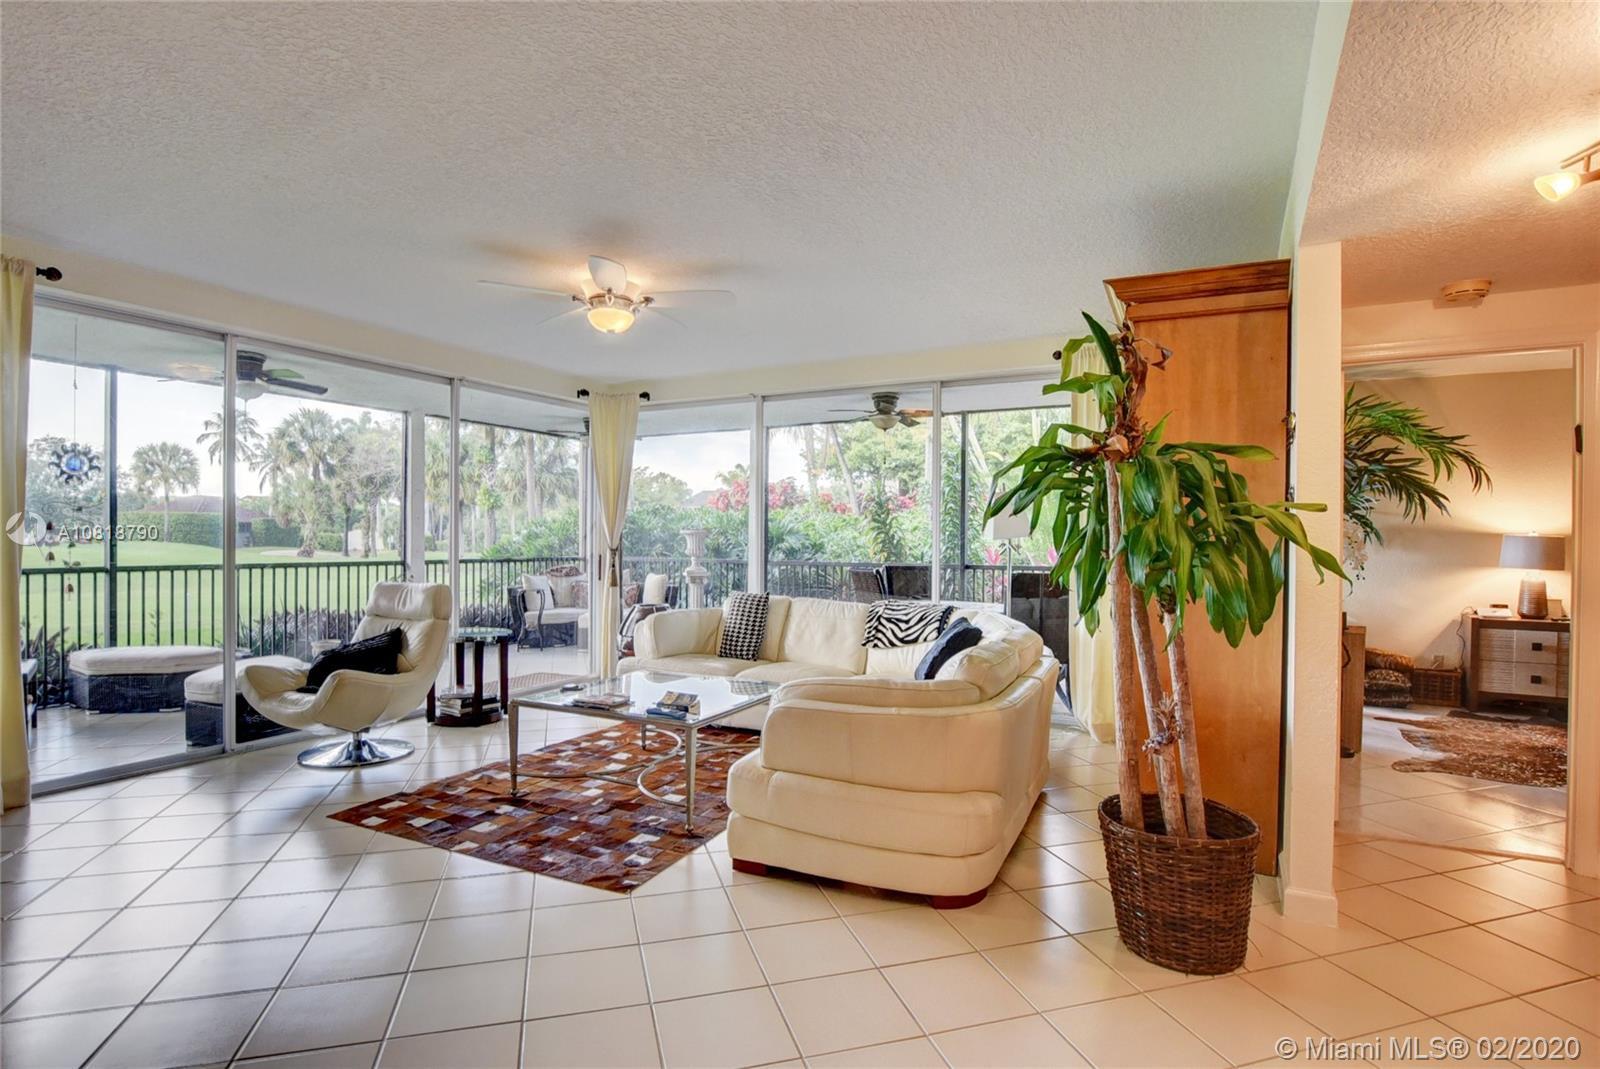 7658 Elmridge Dr 18-L, Boca Raton, FL 33433